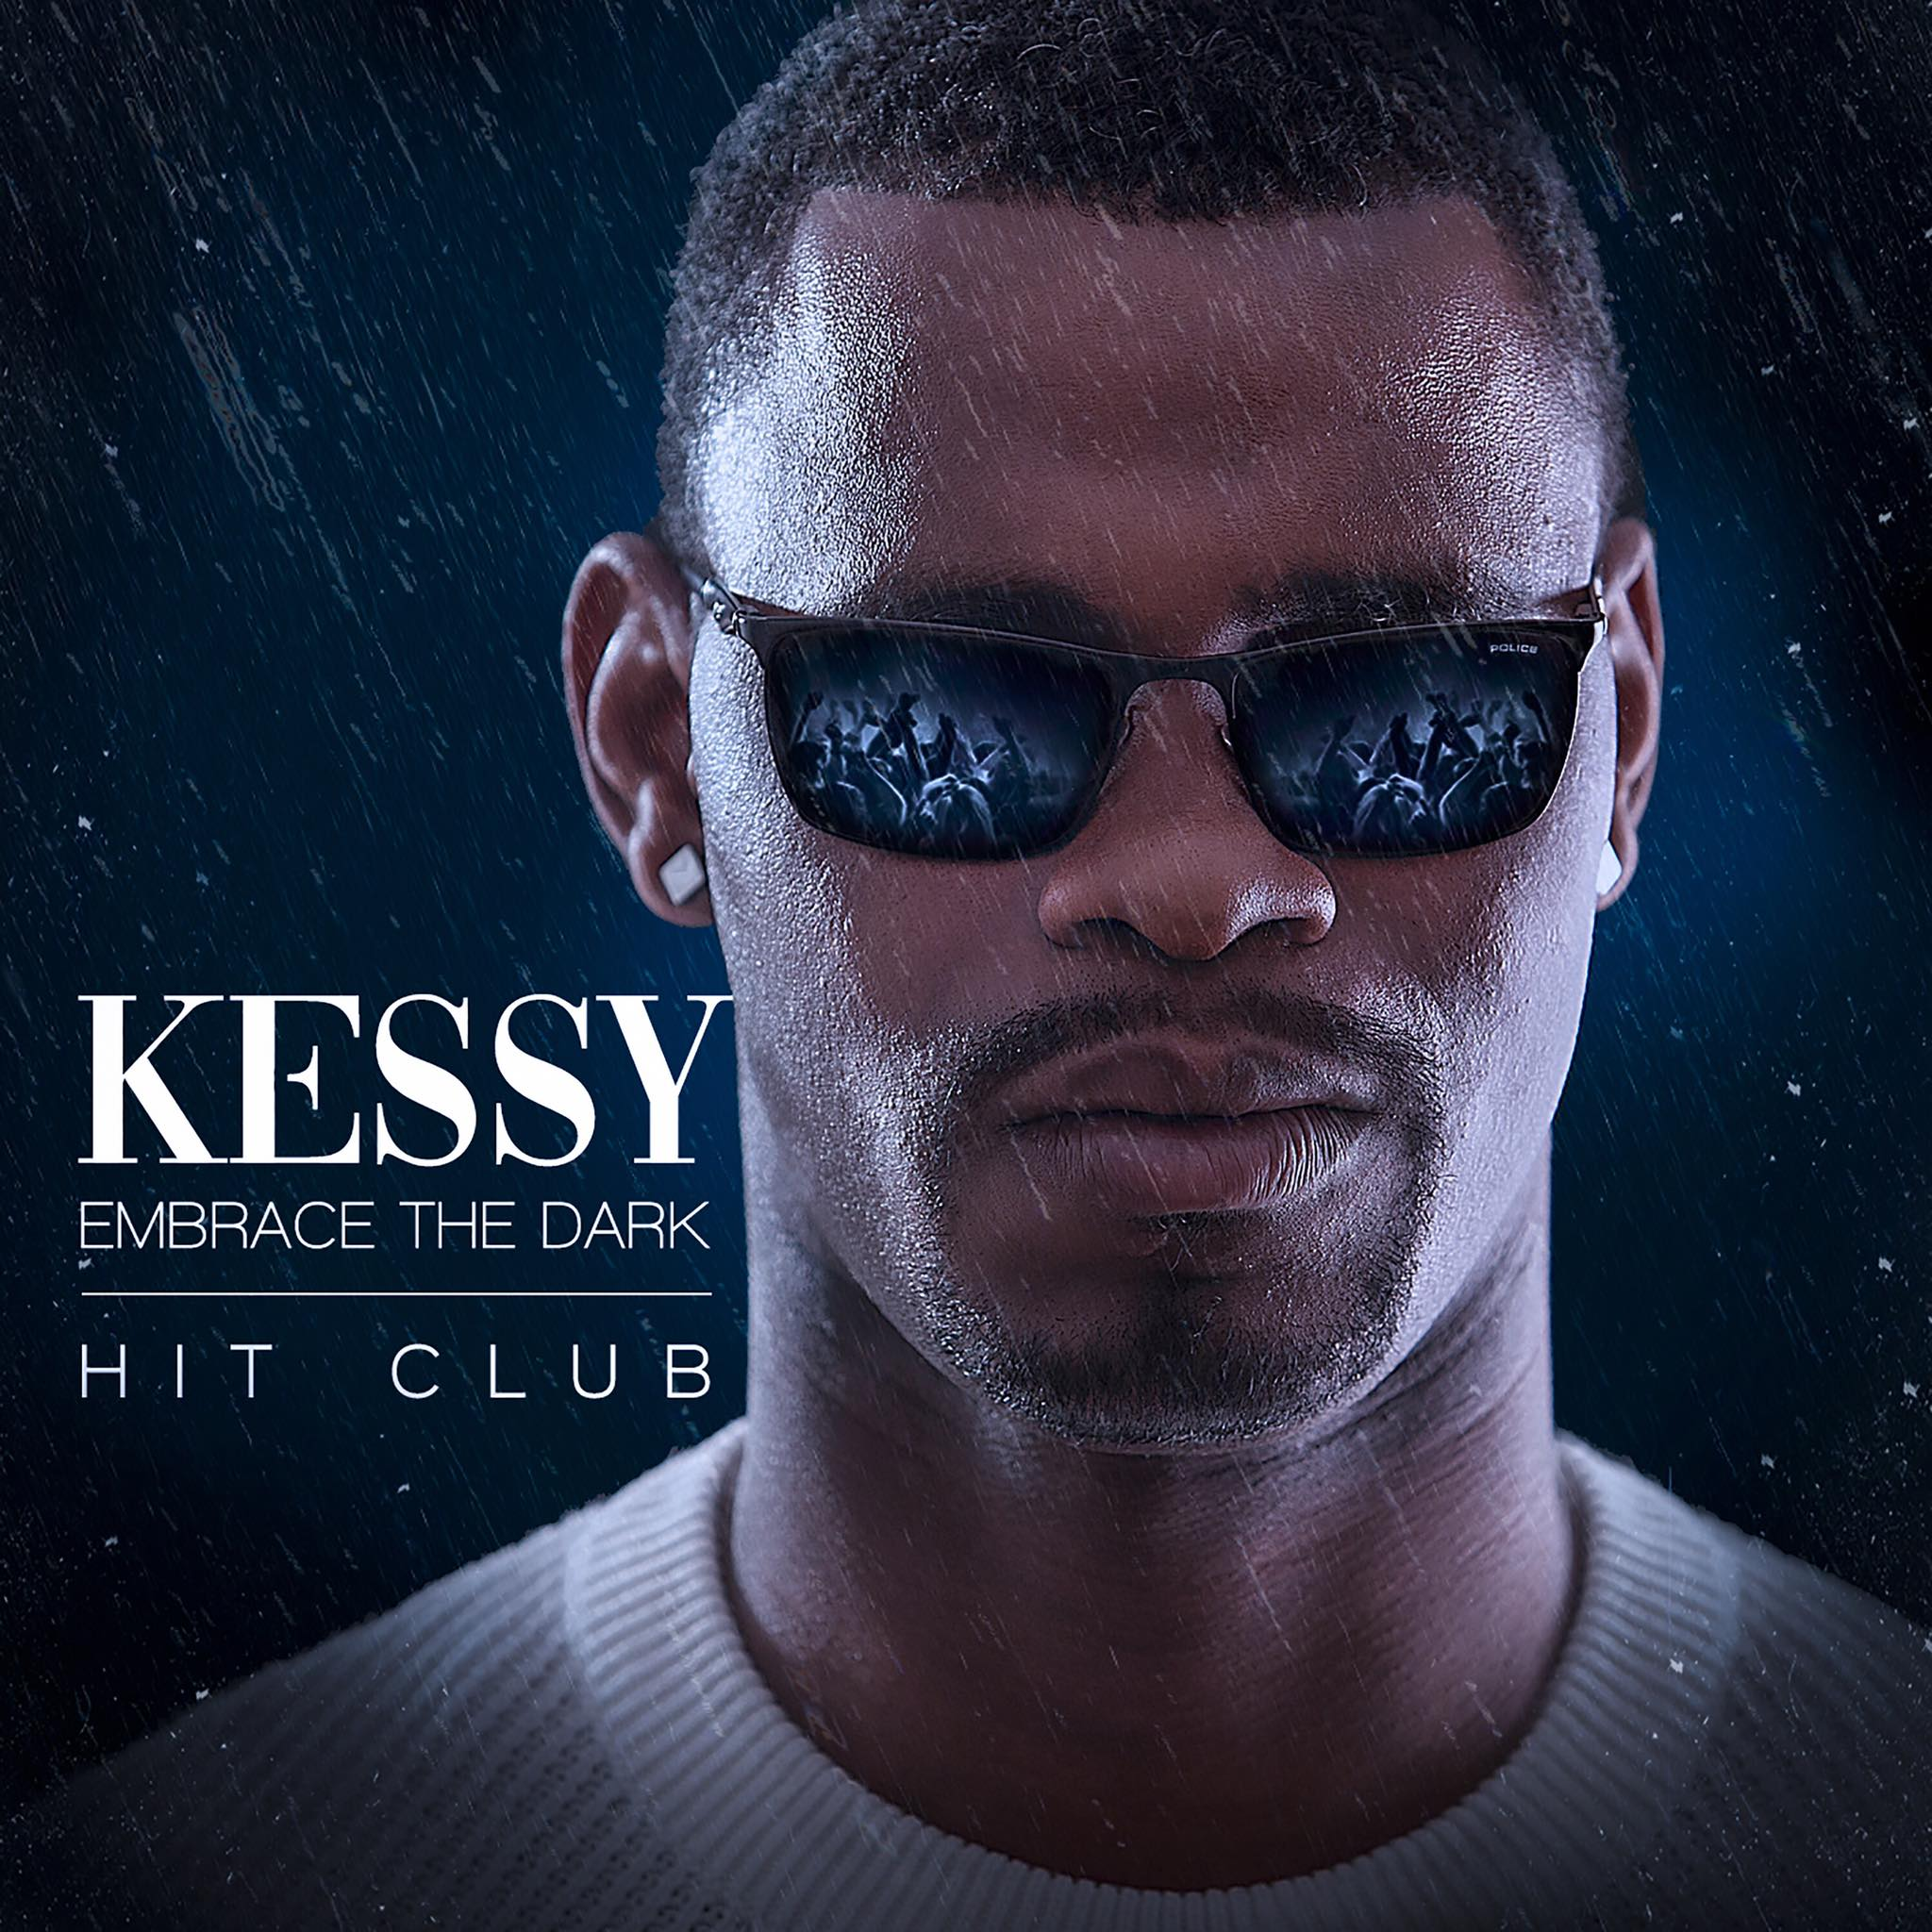 Kessy Embrace The Dark. Lyrics by lyricist Arron Storey